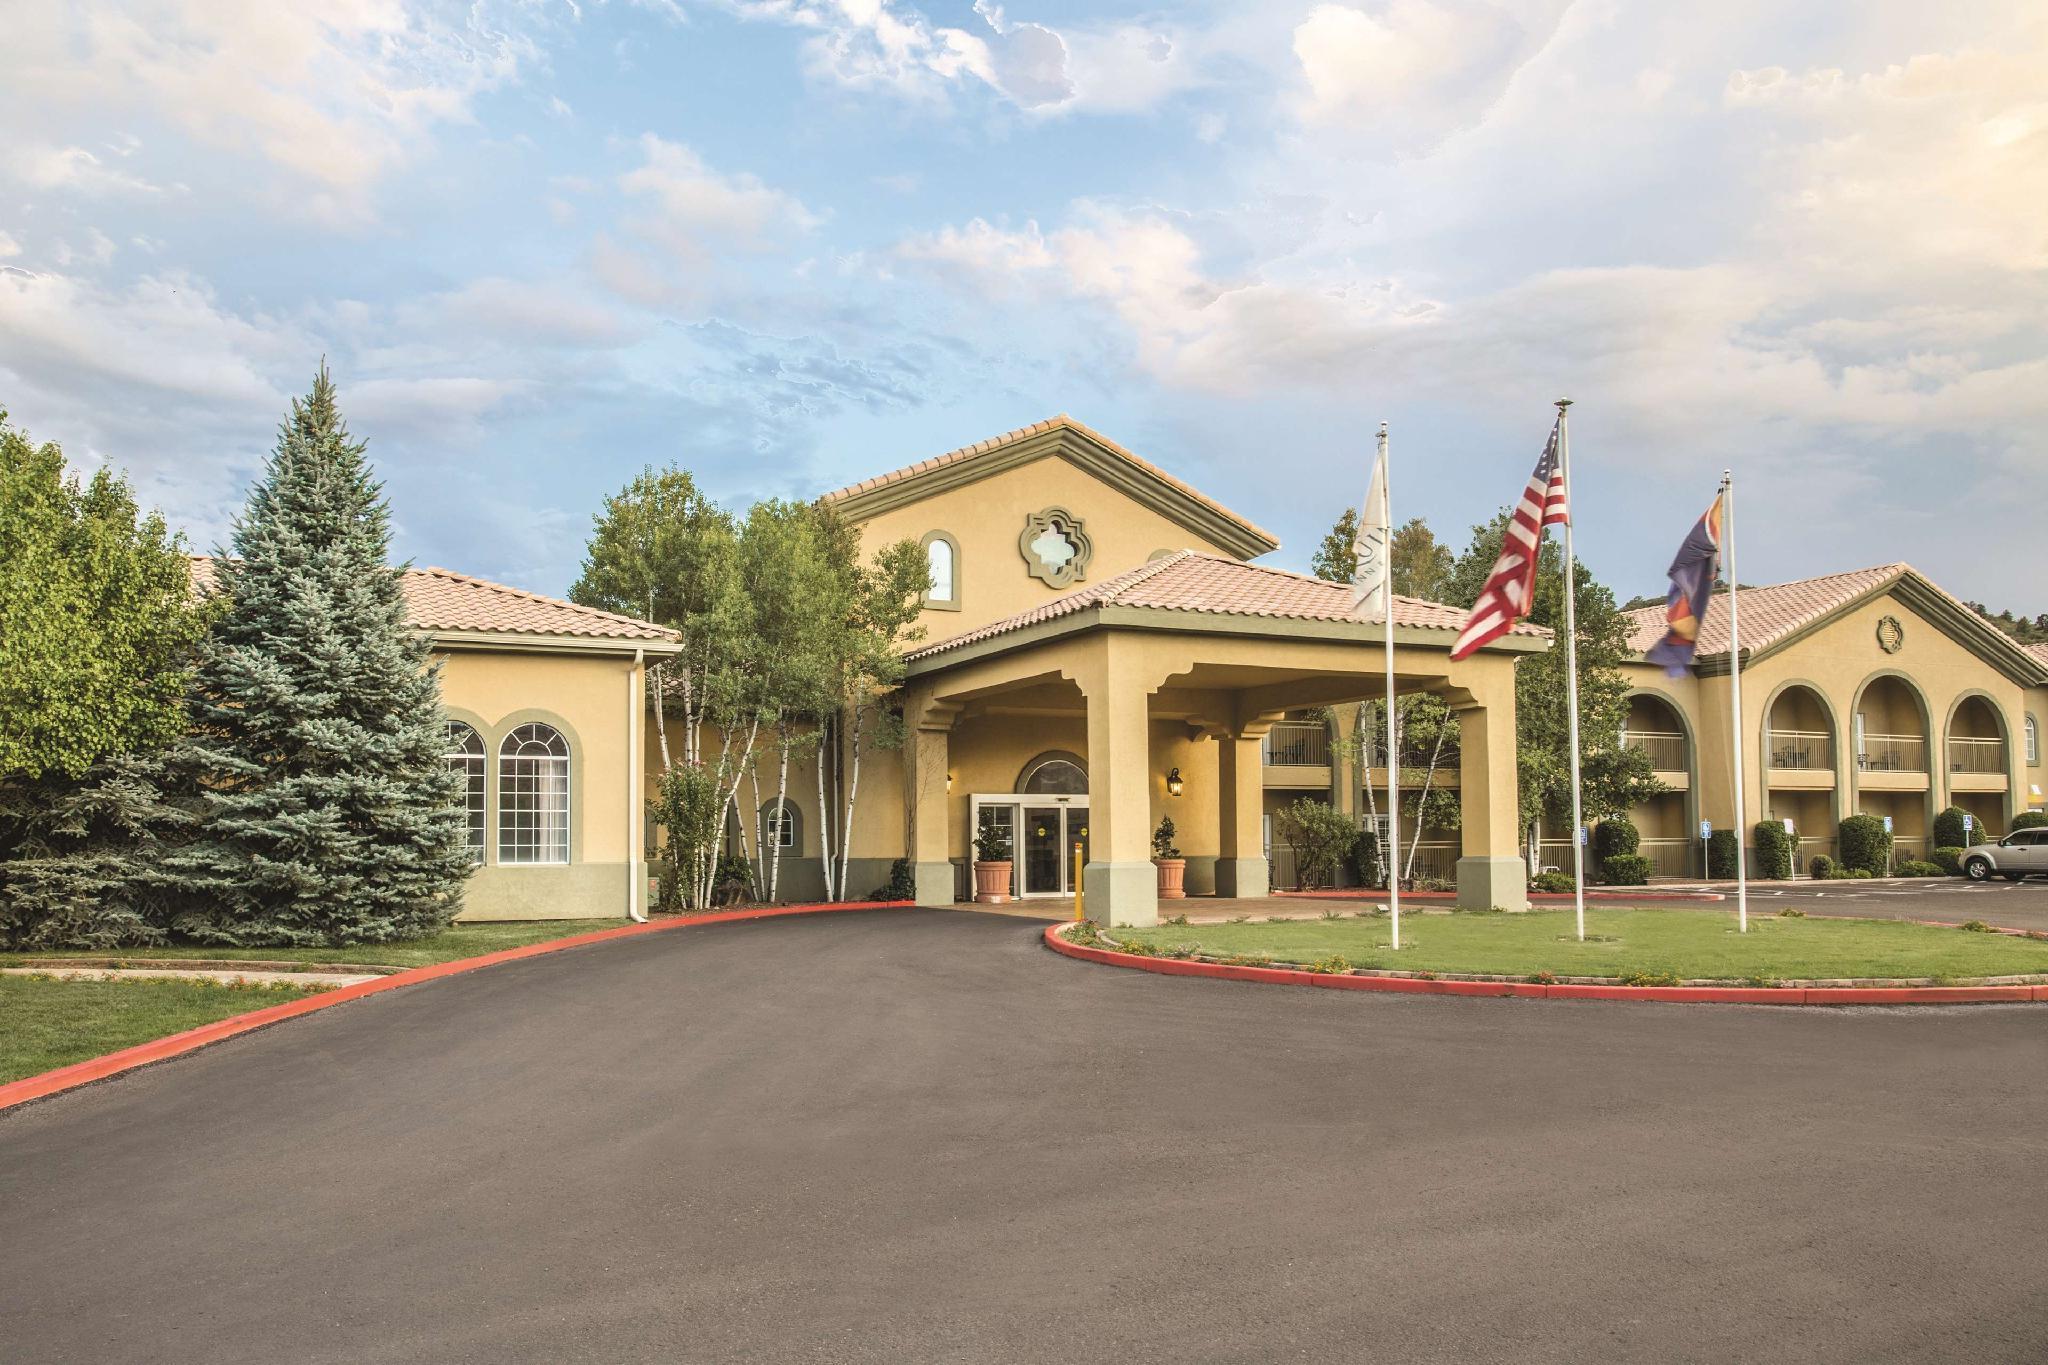 La Quinta Inn And Suites By Wyndham Conference Center Prescott